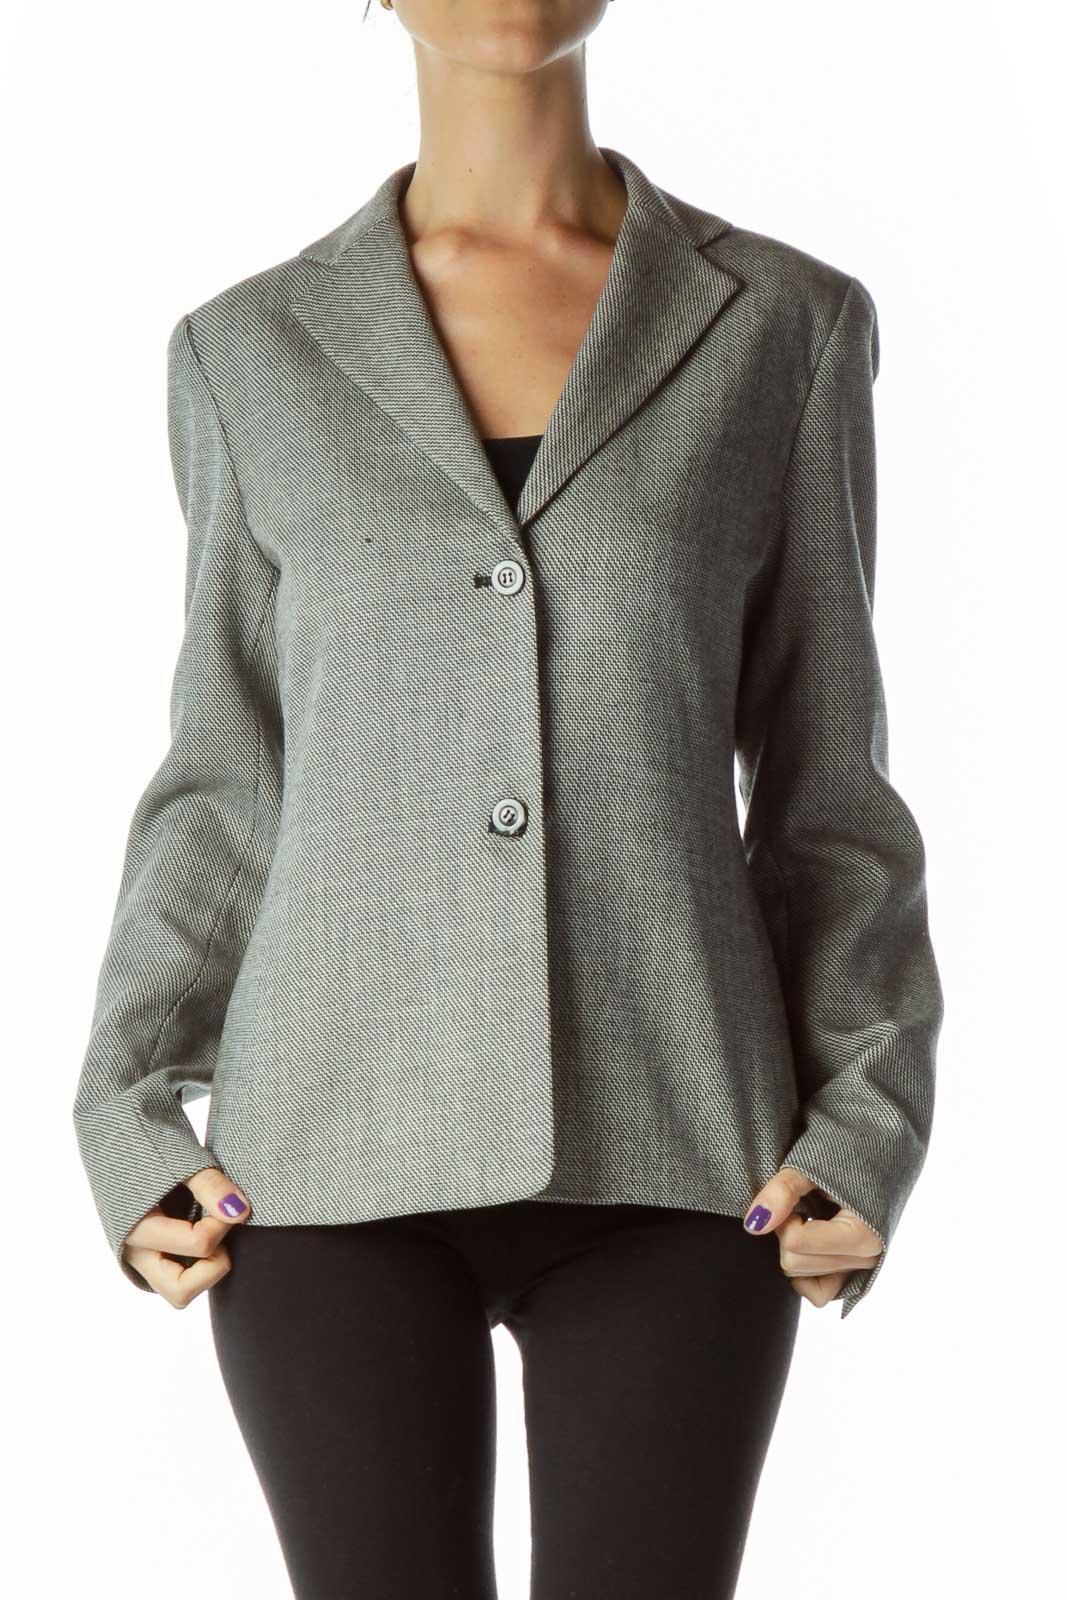 Black White Tweed Blazer Front